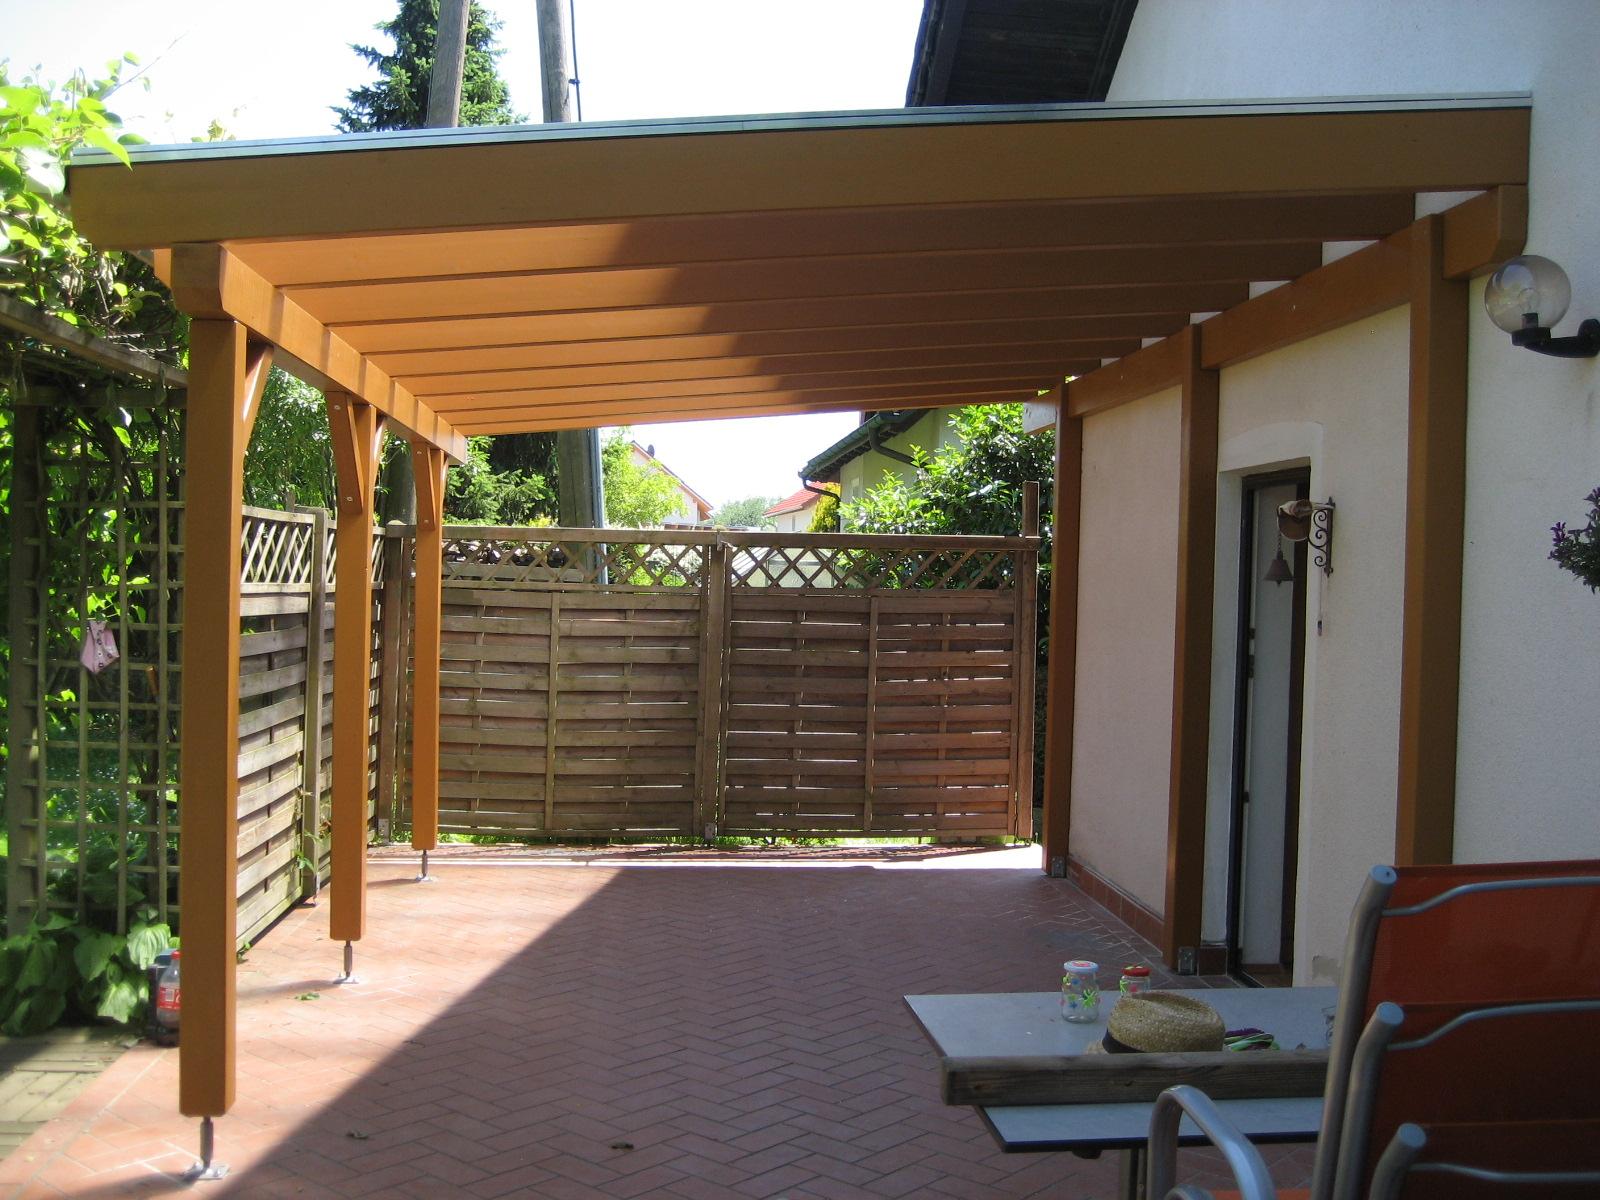 Terrasseüberdachung mit Thermoclear-Stegplatten